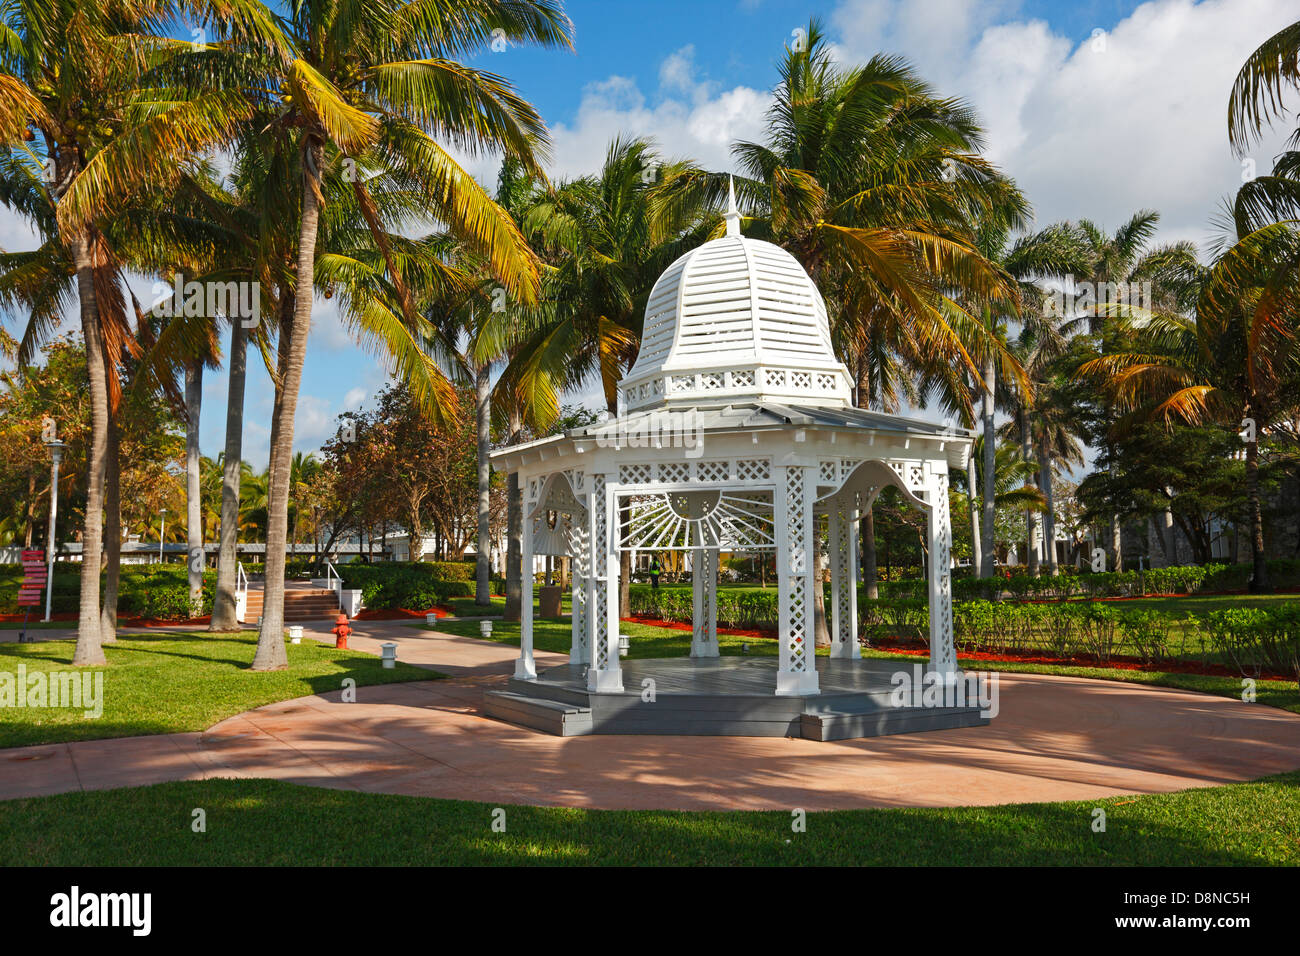 Radisson Grand Lucayan Resort. Freeport - Bahamas - Stock Image